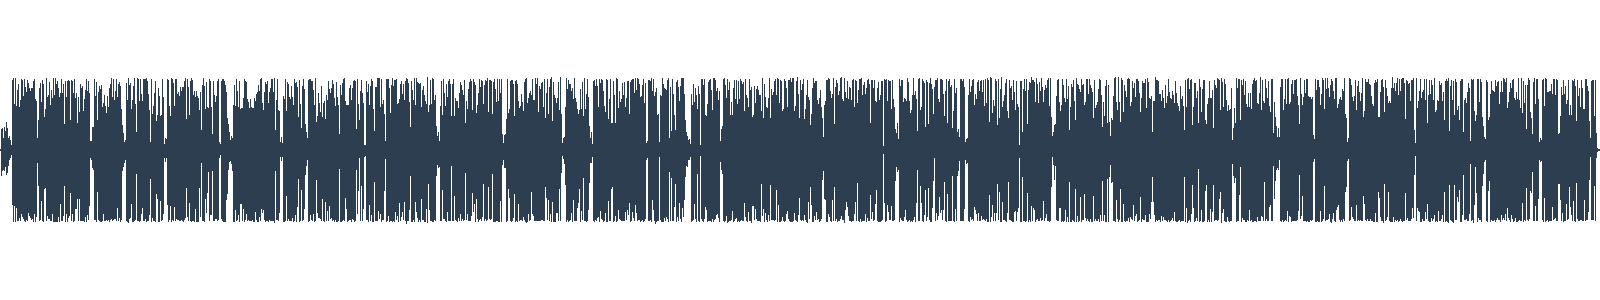 (7) WESTech Krásavica kolobežka Xiaomi waveform